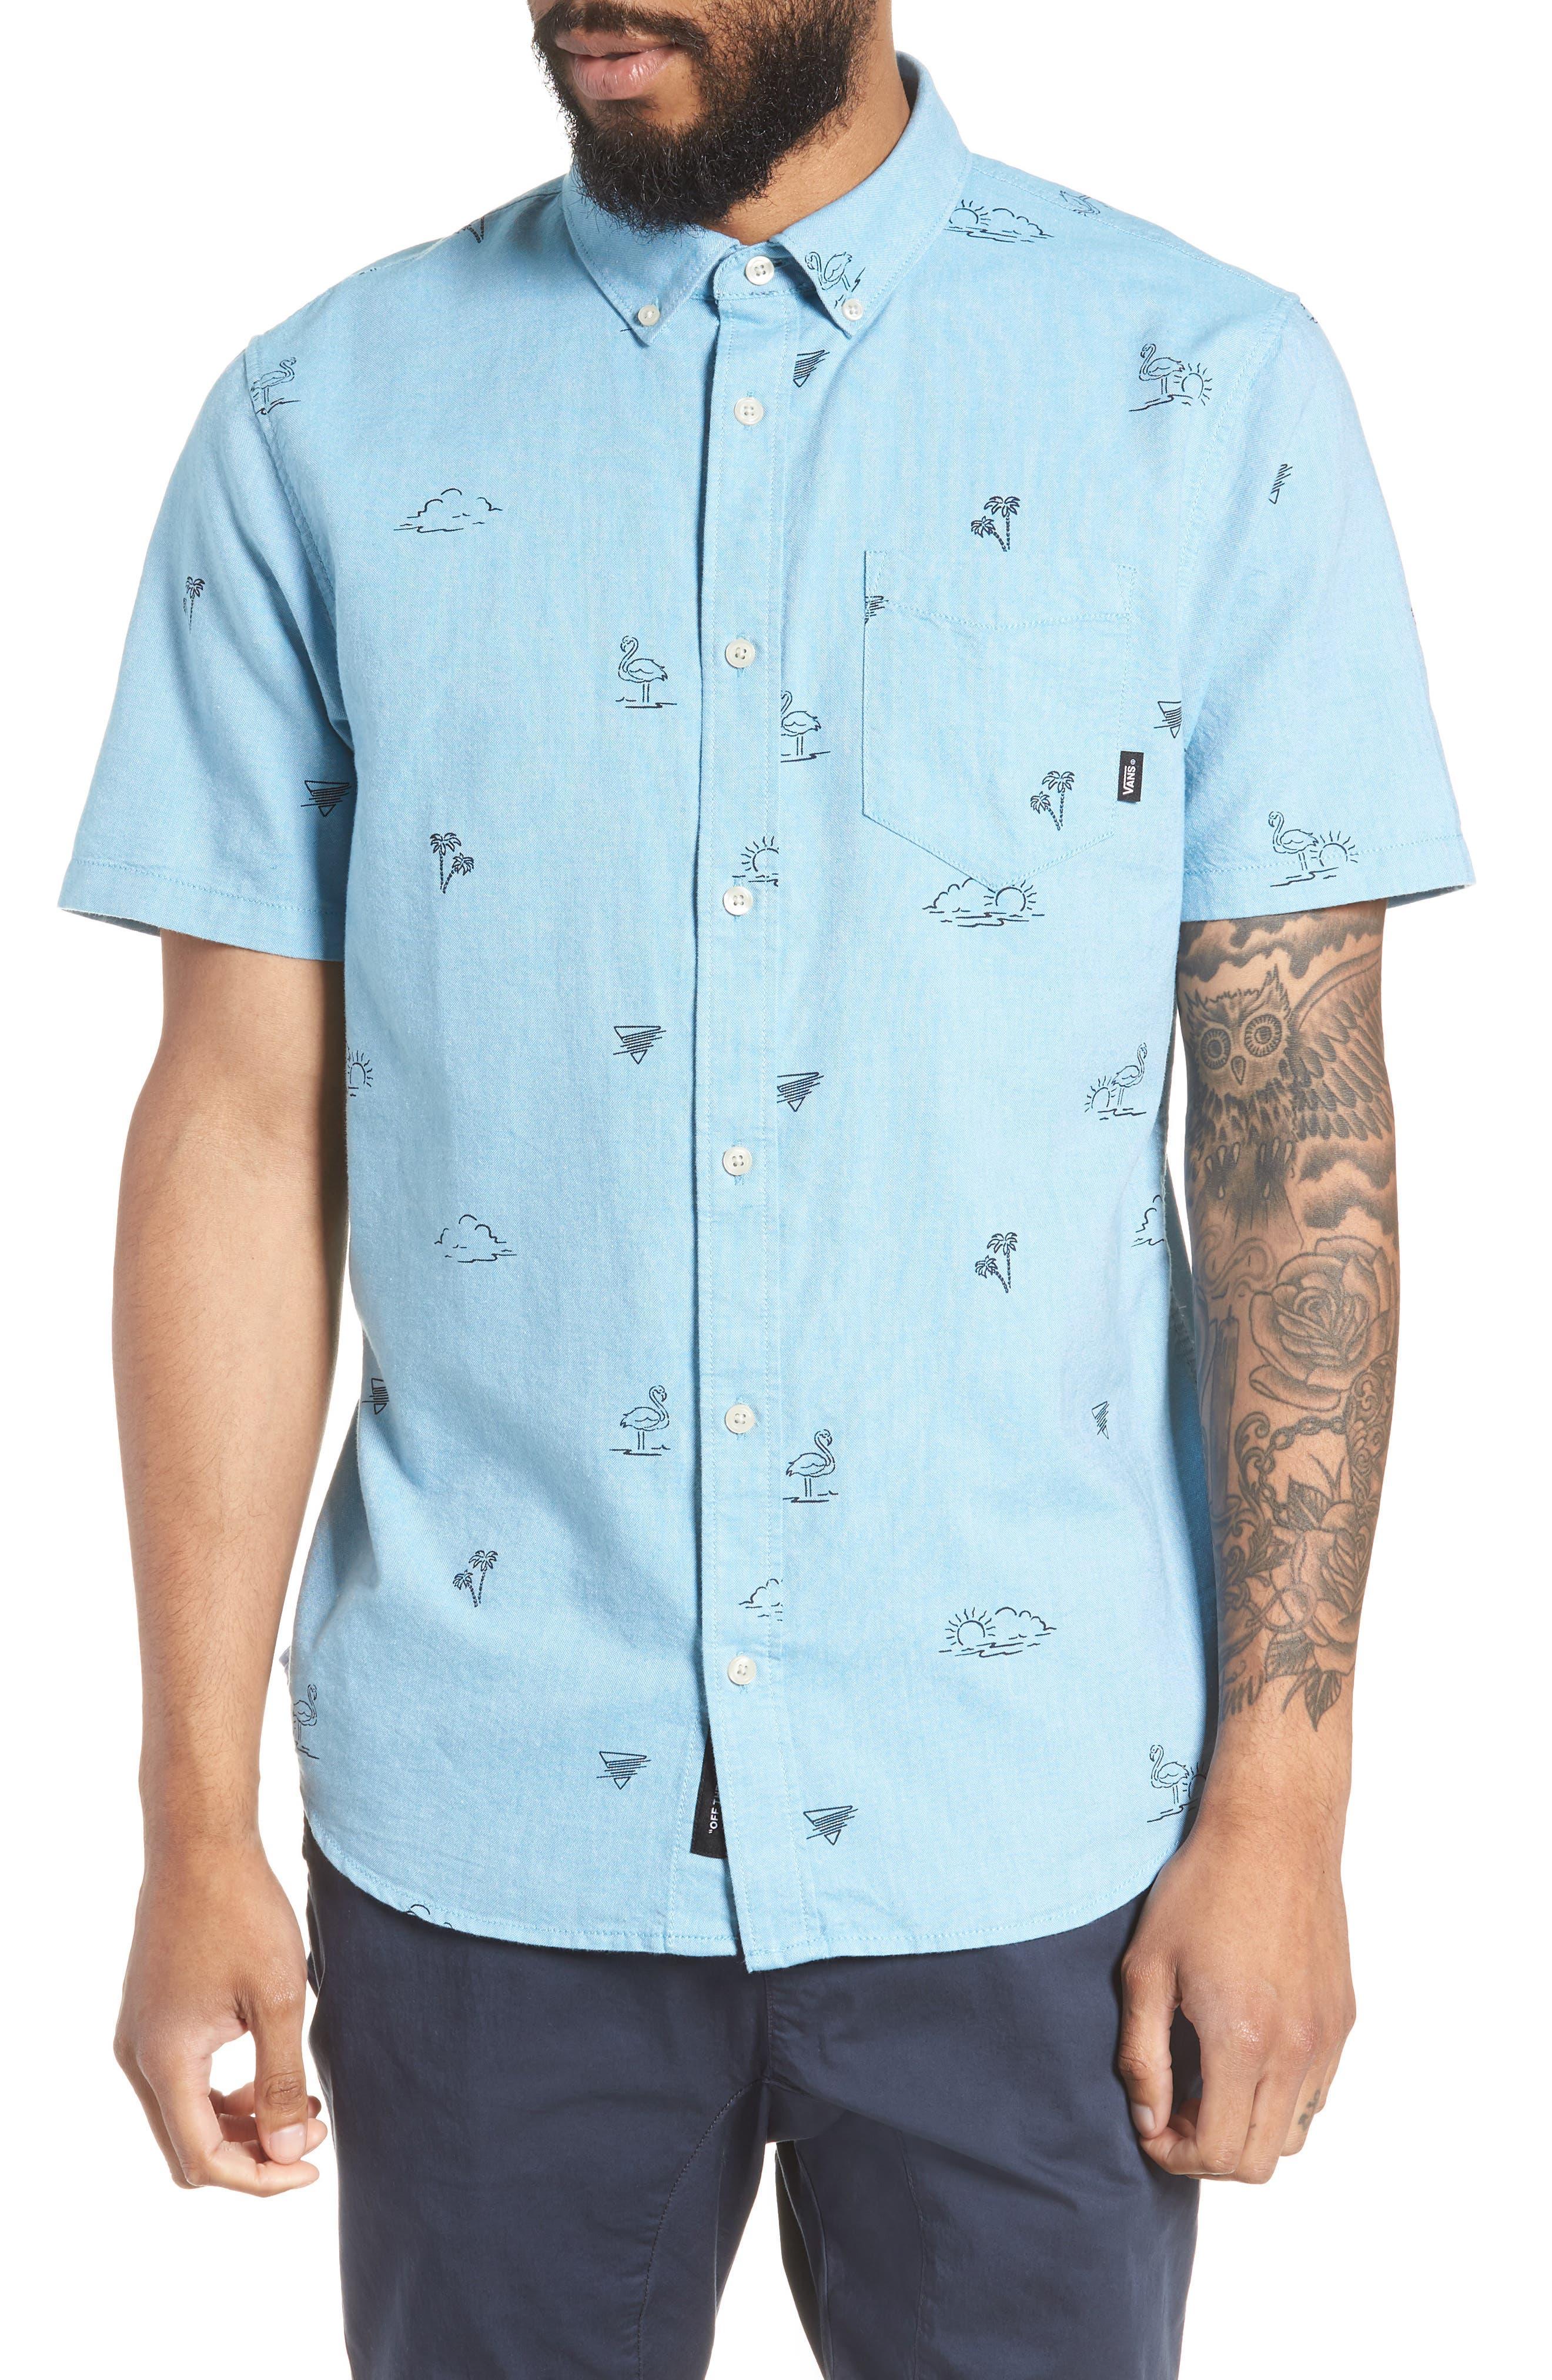 Houser Woven Shirt,                             Main thumbnail 1, color,                             Blue Moon Road Trippin